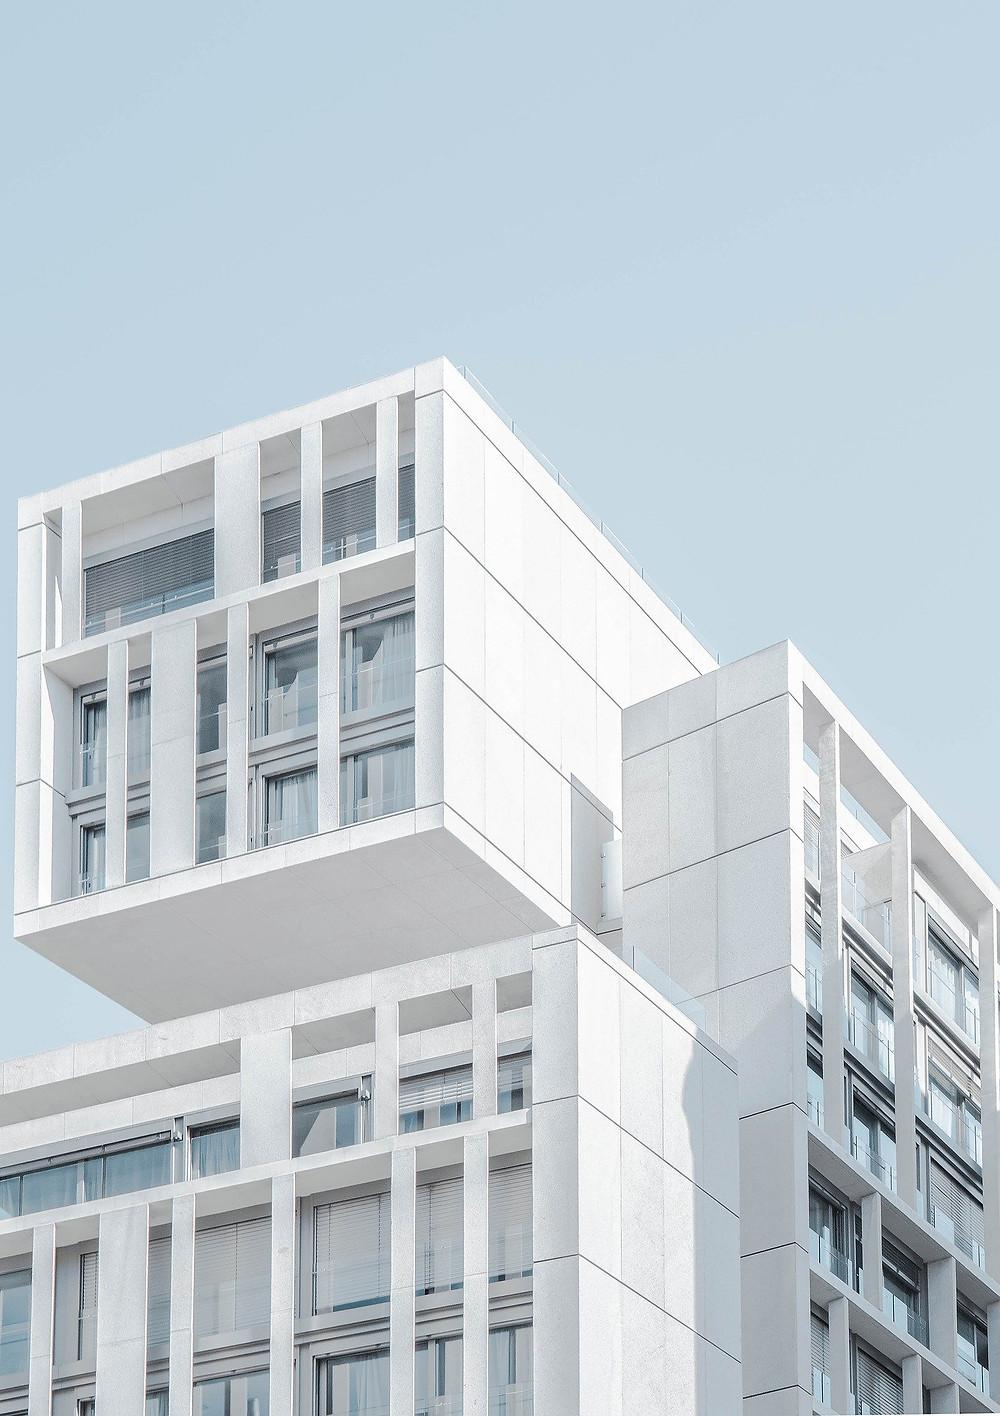 Air pollution apartment buildings